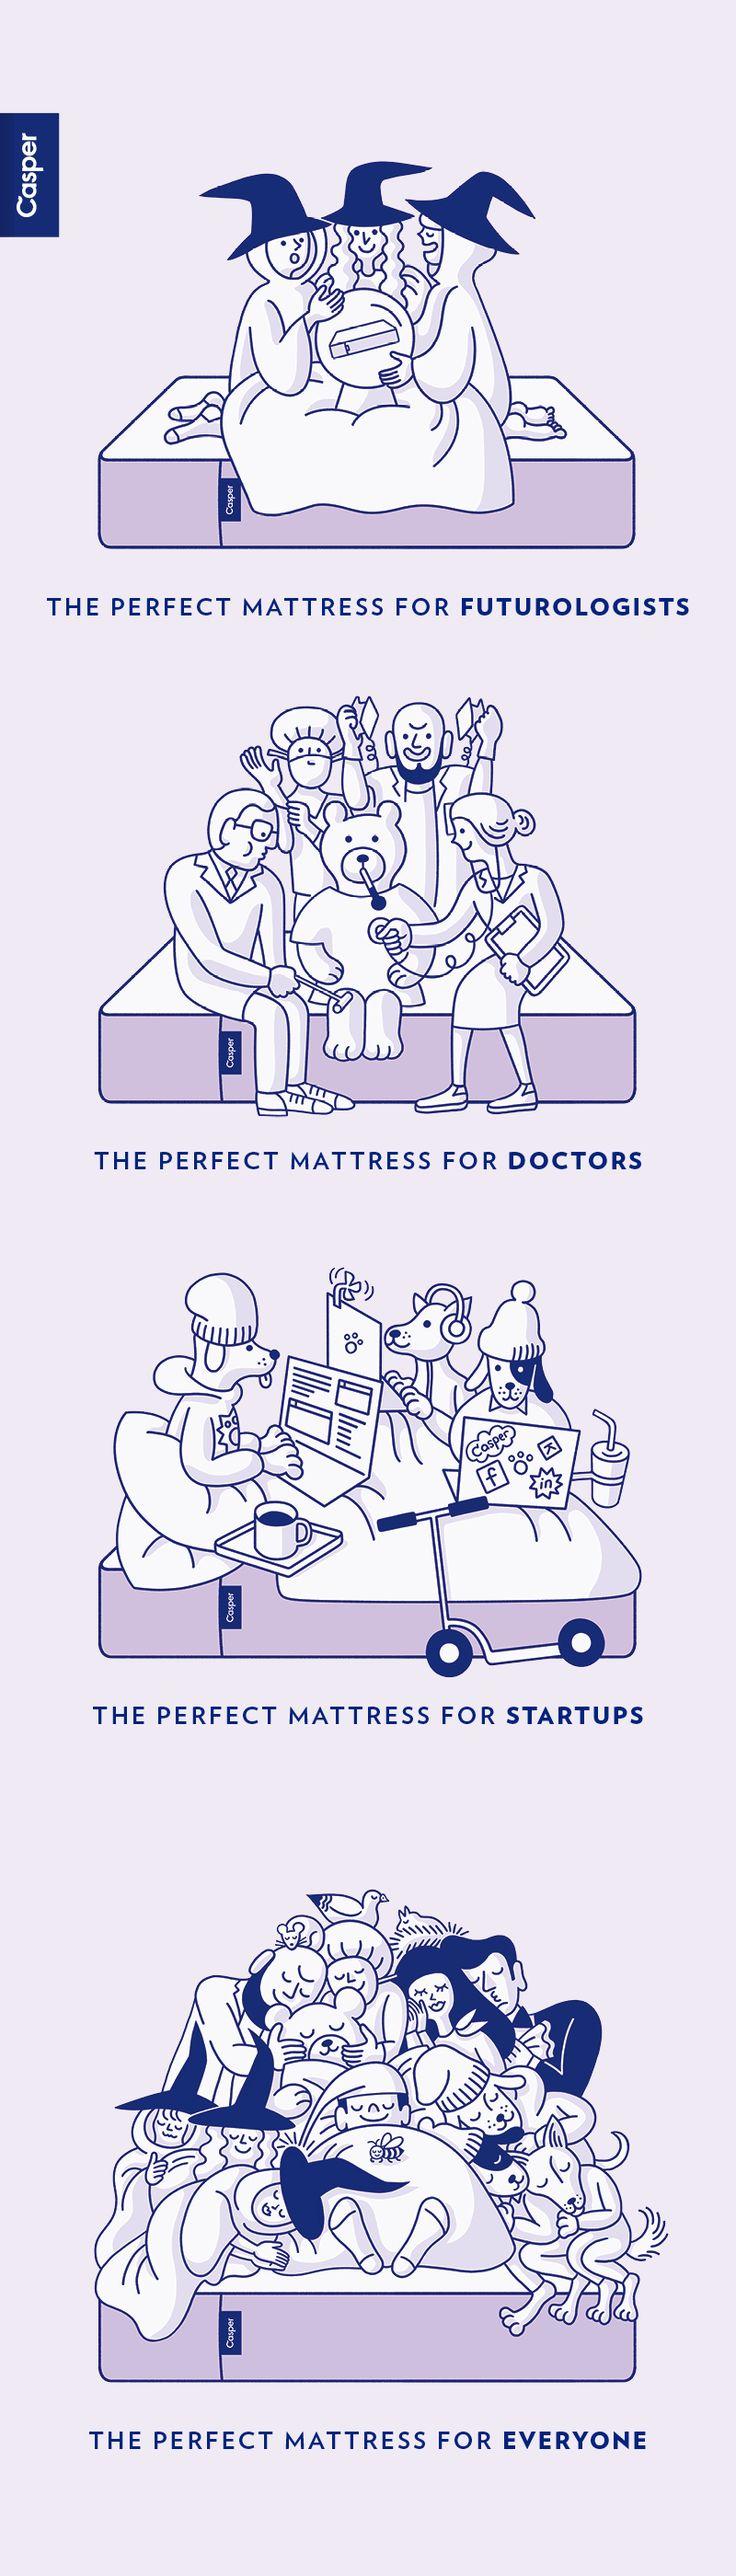 15 Best Mattress Advertising Images On Pinterest